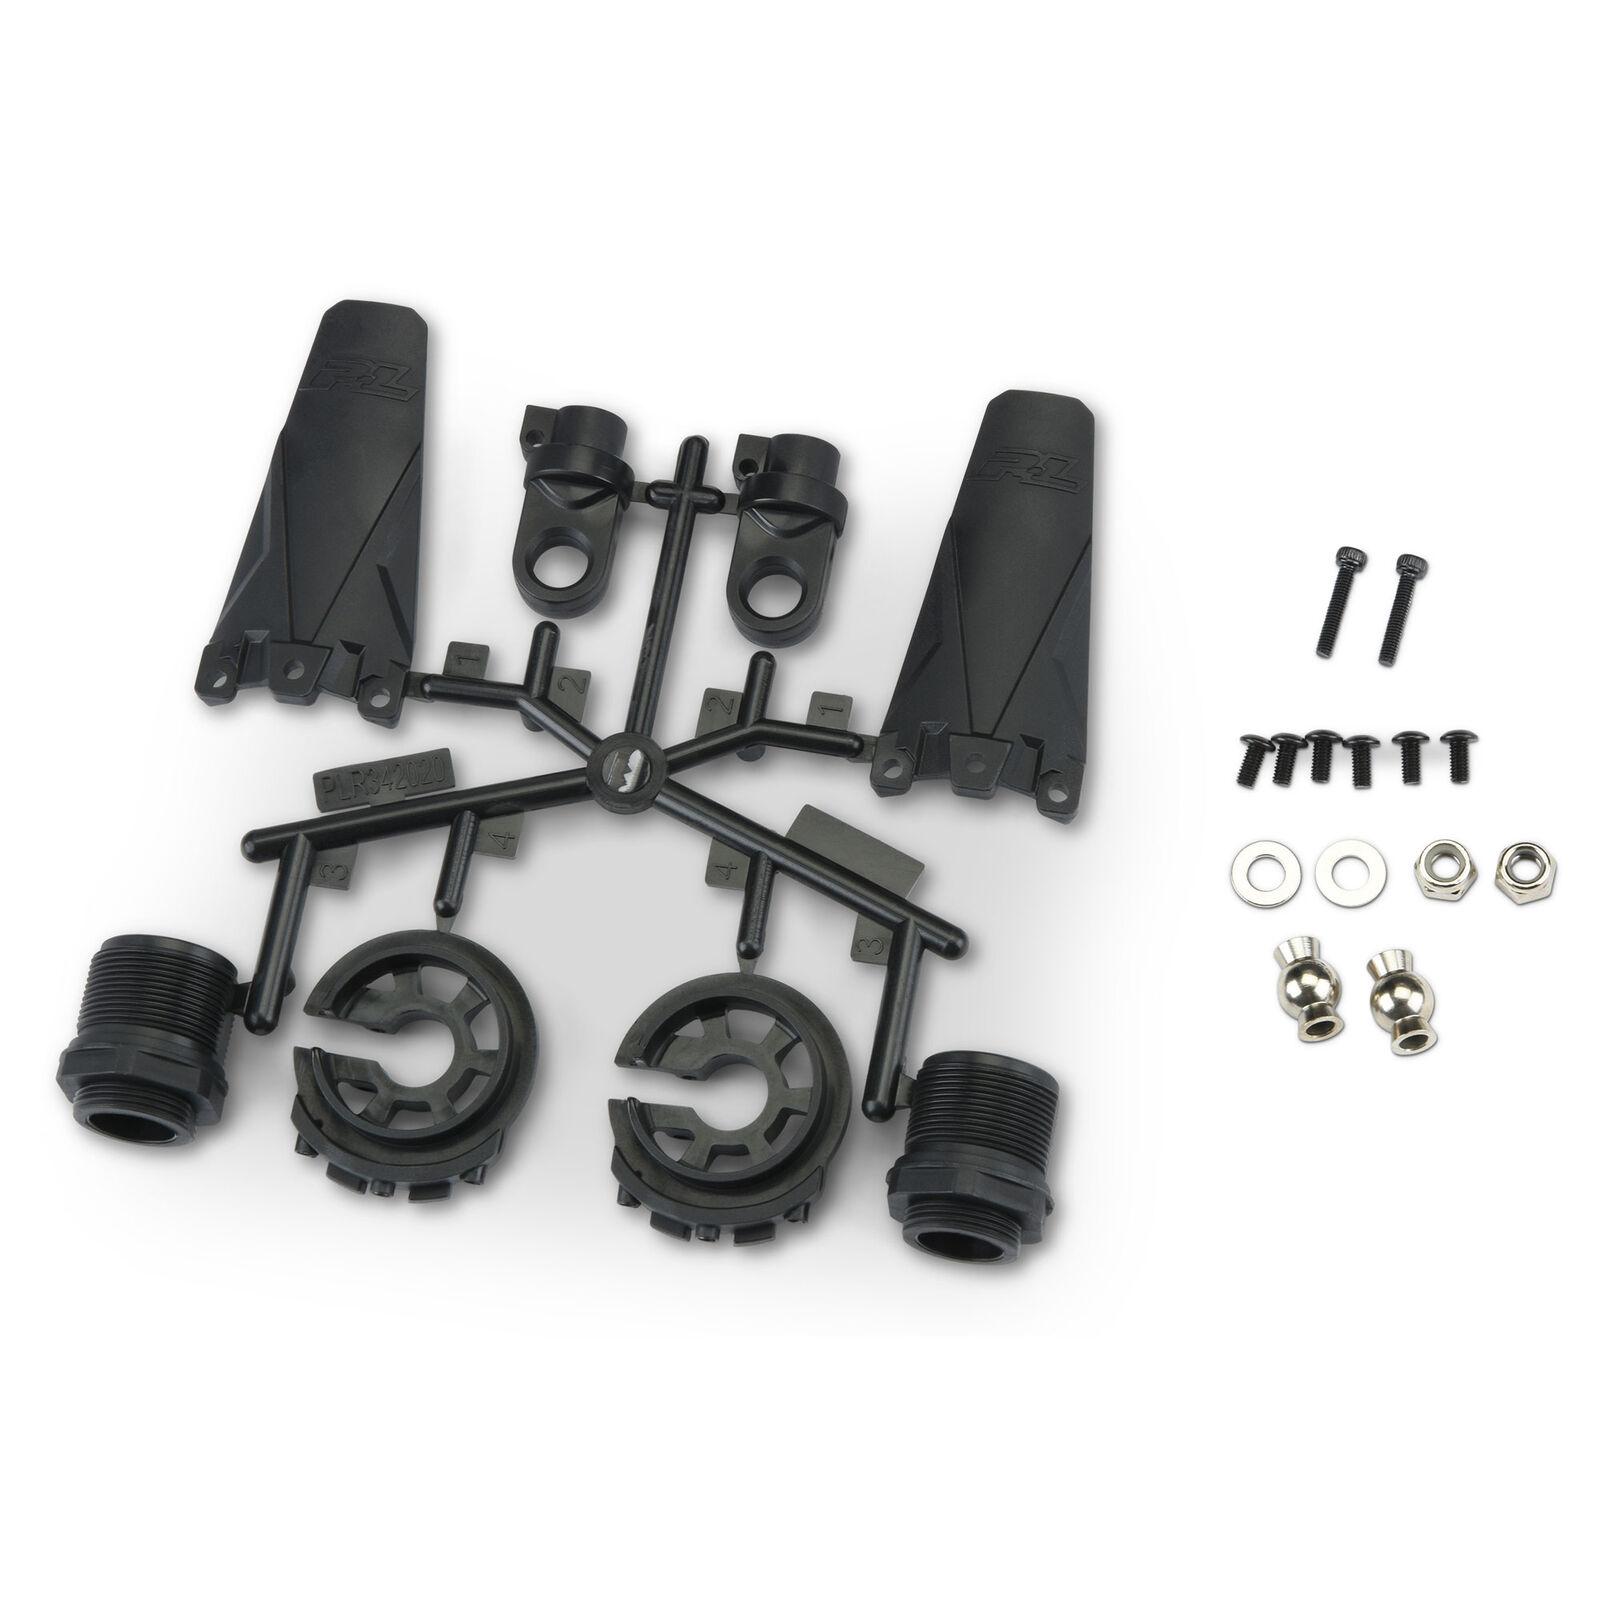 1/5 PowerStroke HD Plastics & Hardware Replacement